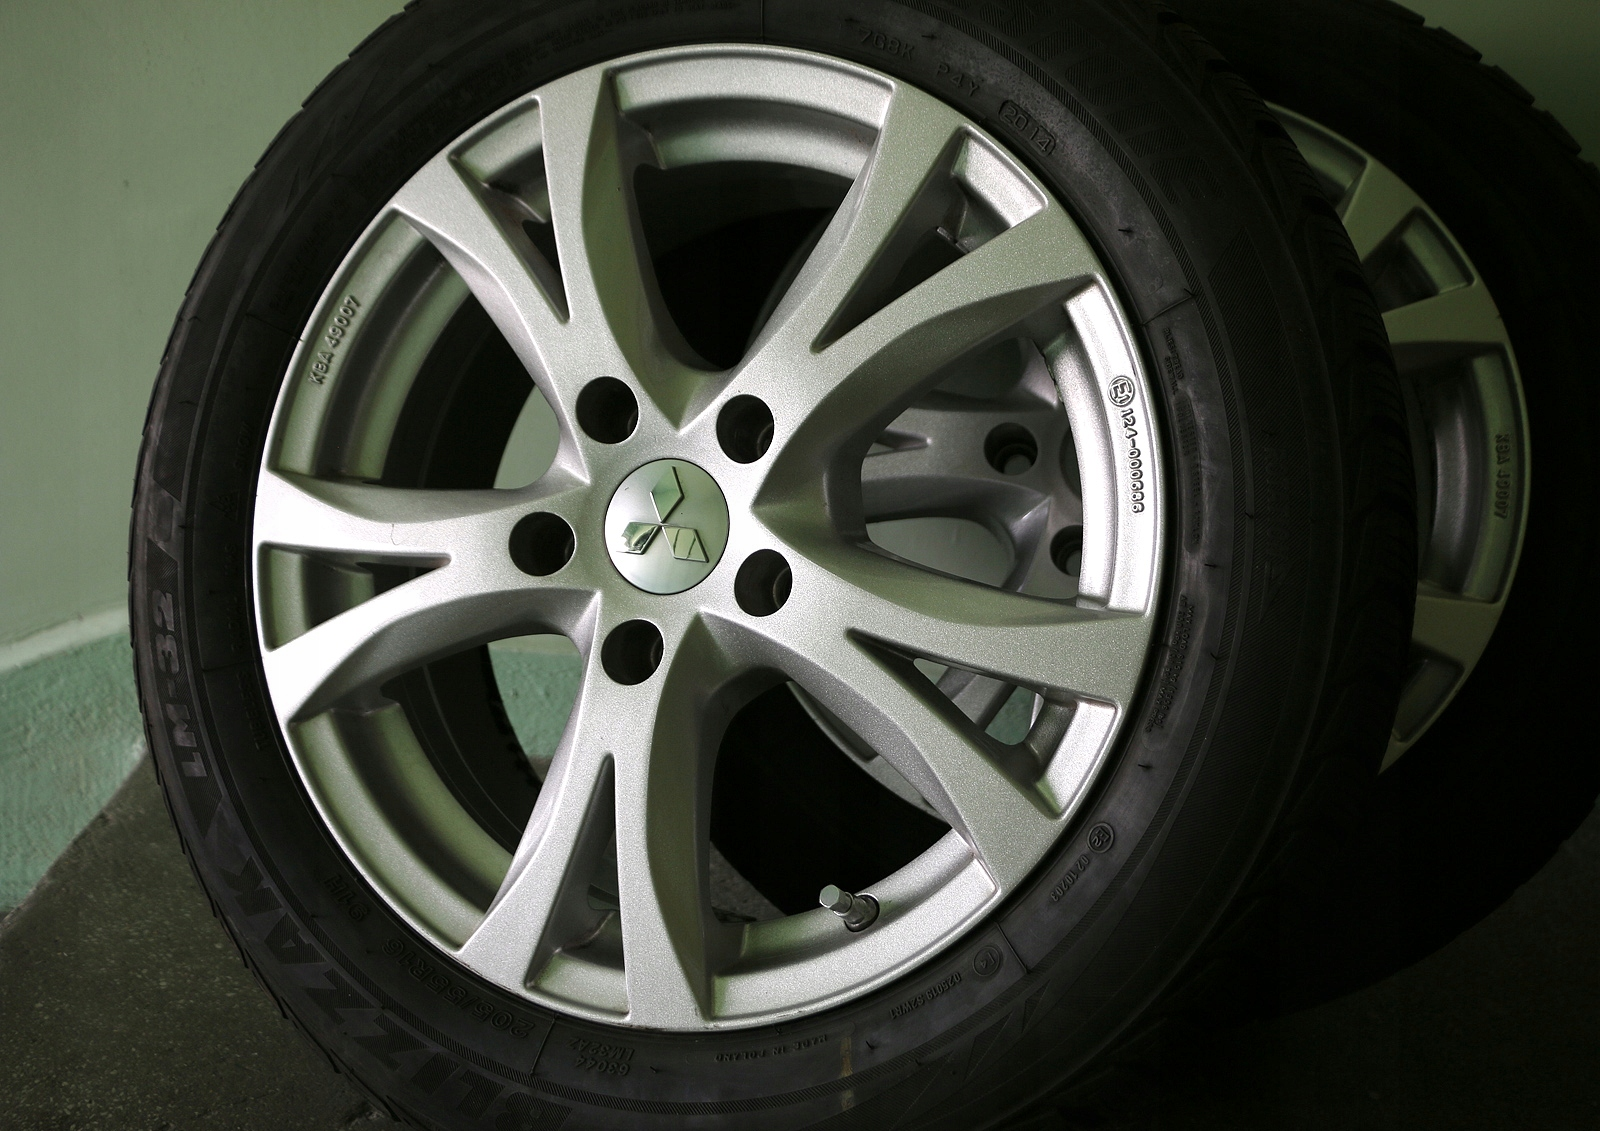 Felgi 16 Opony Zimowe 20555r16 Bridgestone 4 Szt 7584010745